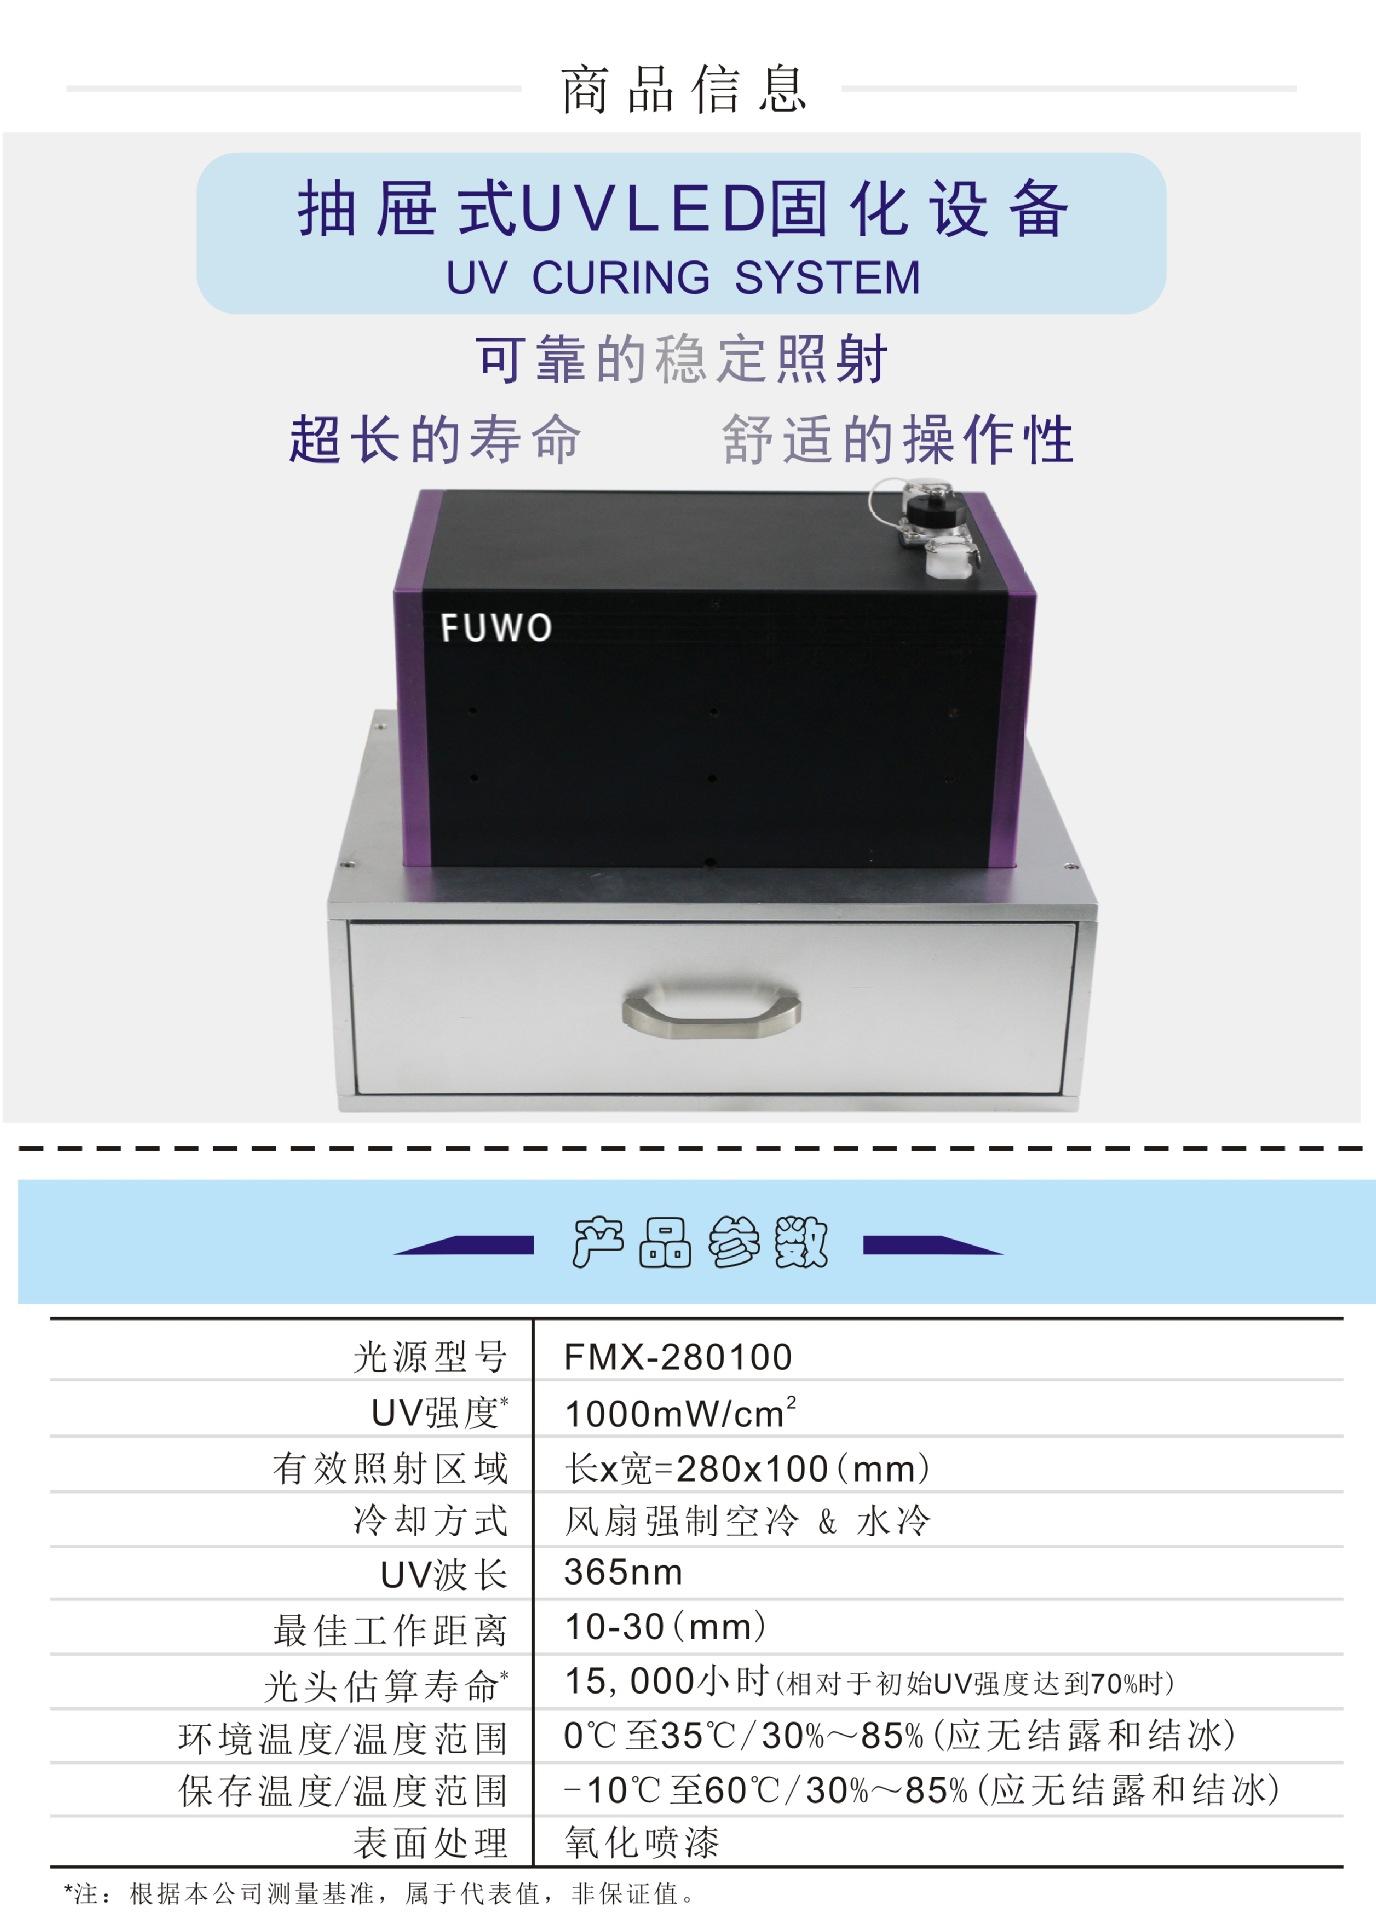 uvled固化设备_抽屉式UVLED固化设备,365nm紫外波长